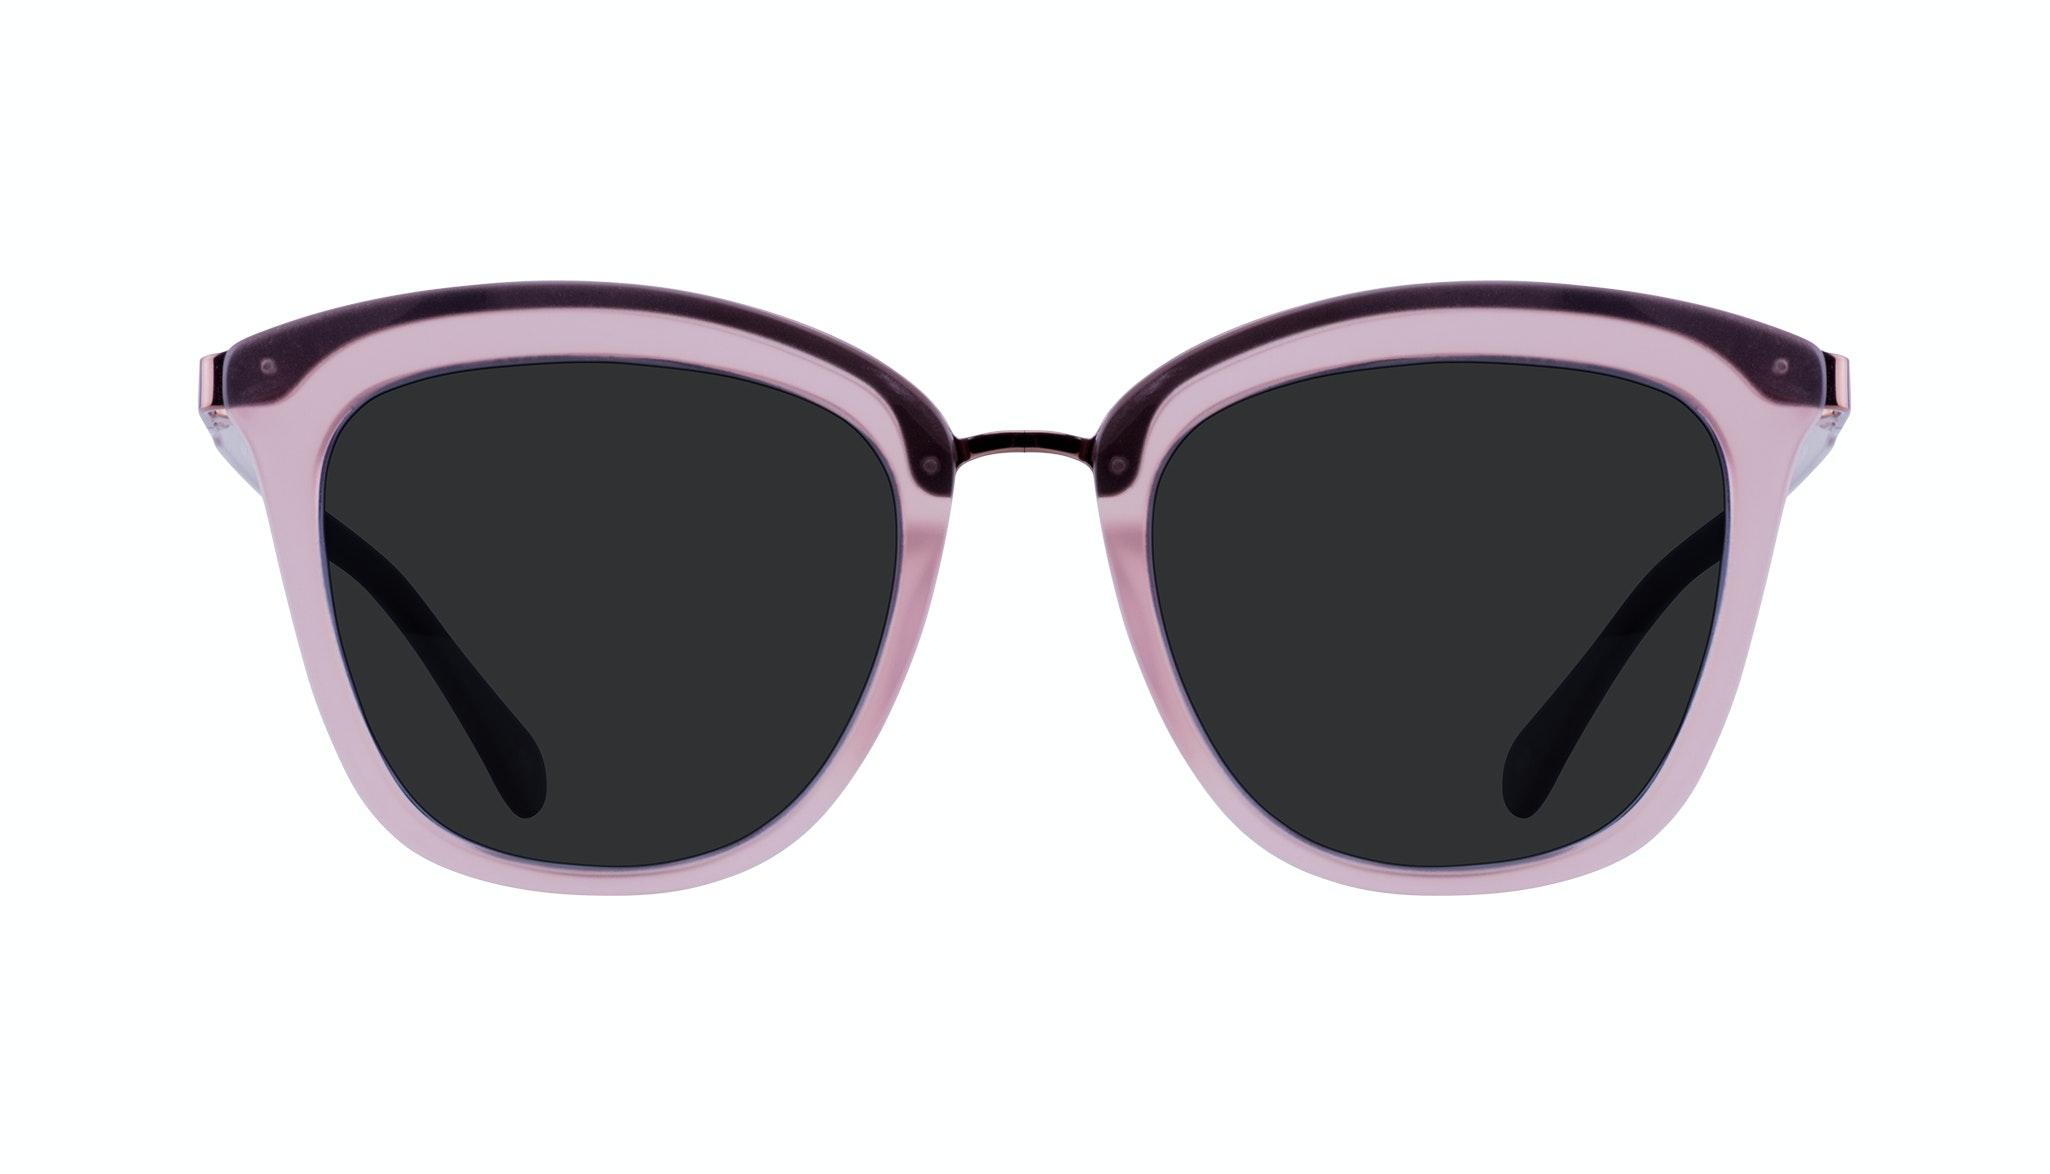 Affordable Fashion Glasses Rectangle Square Sunglasses Women More Blush